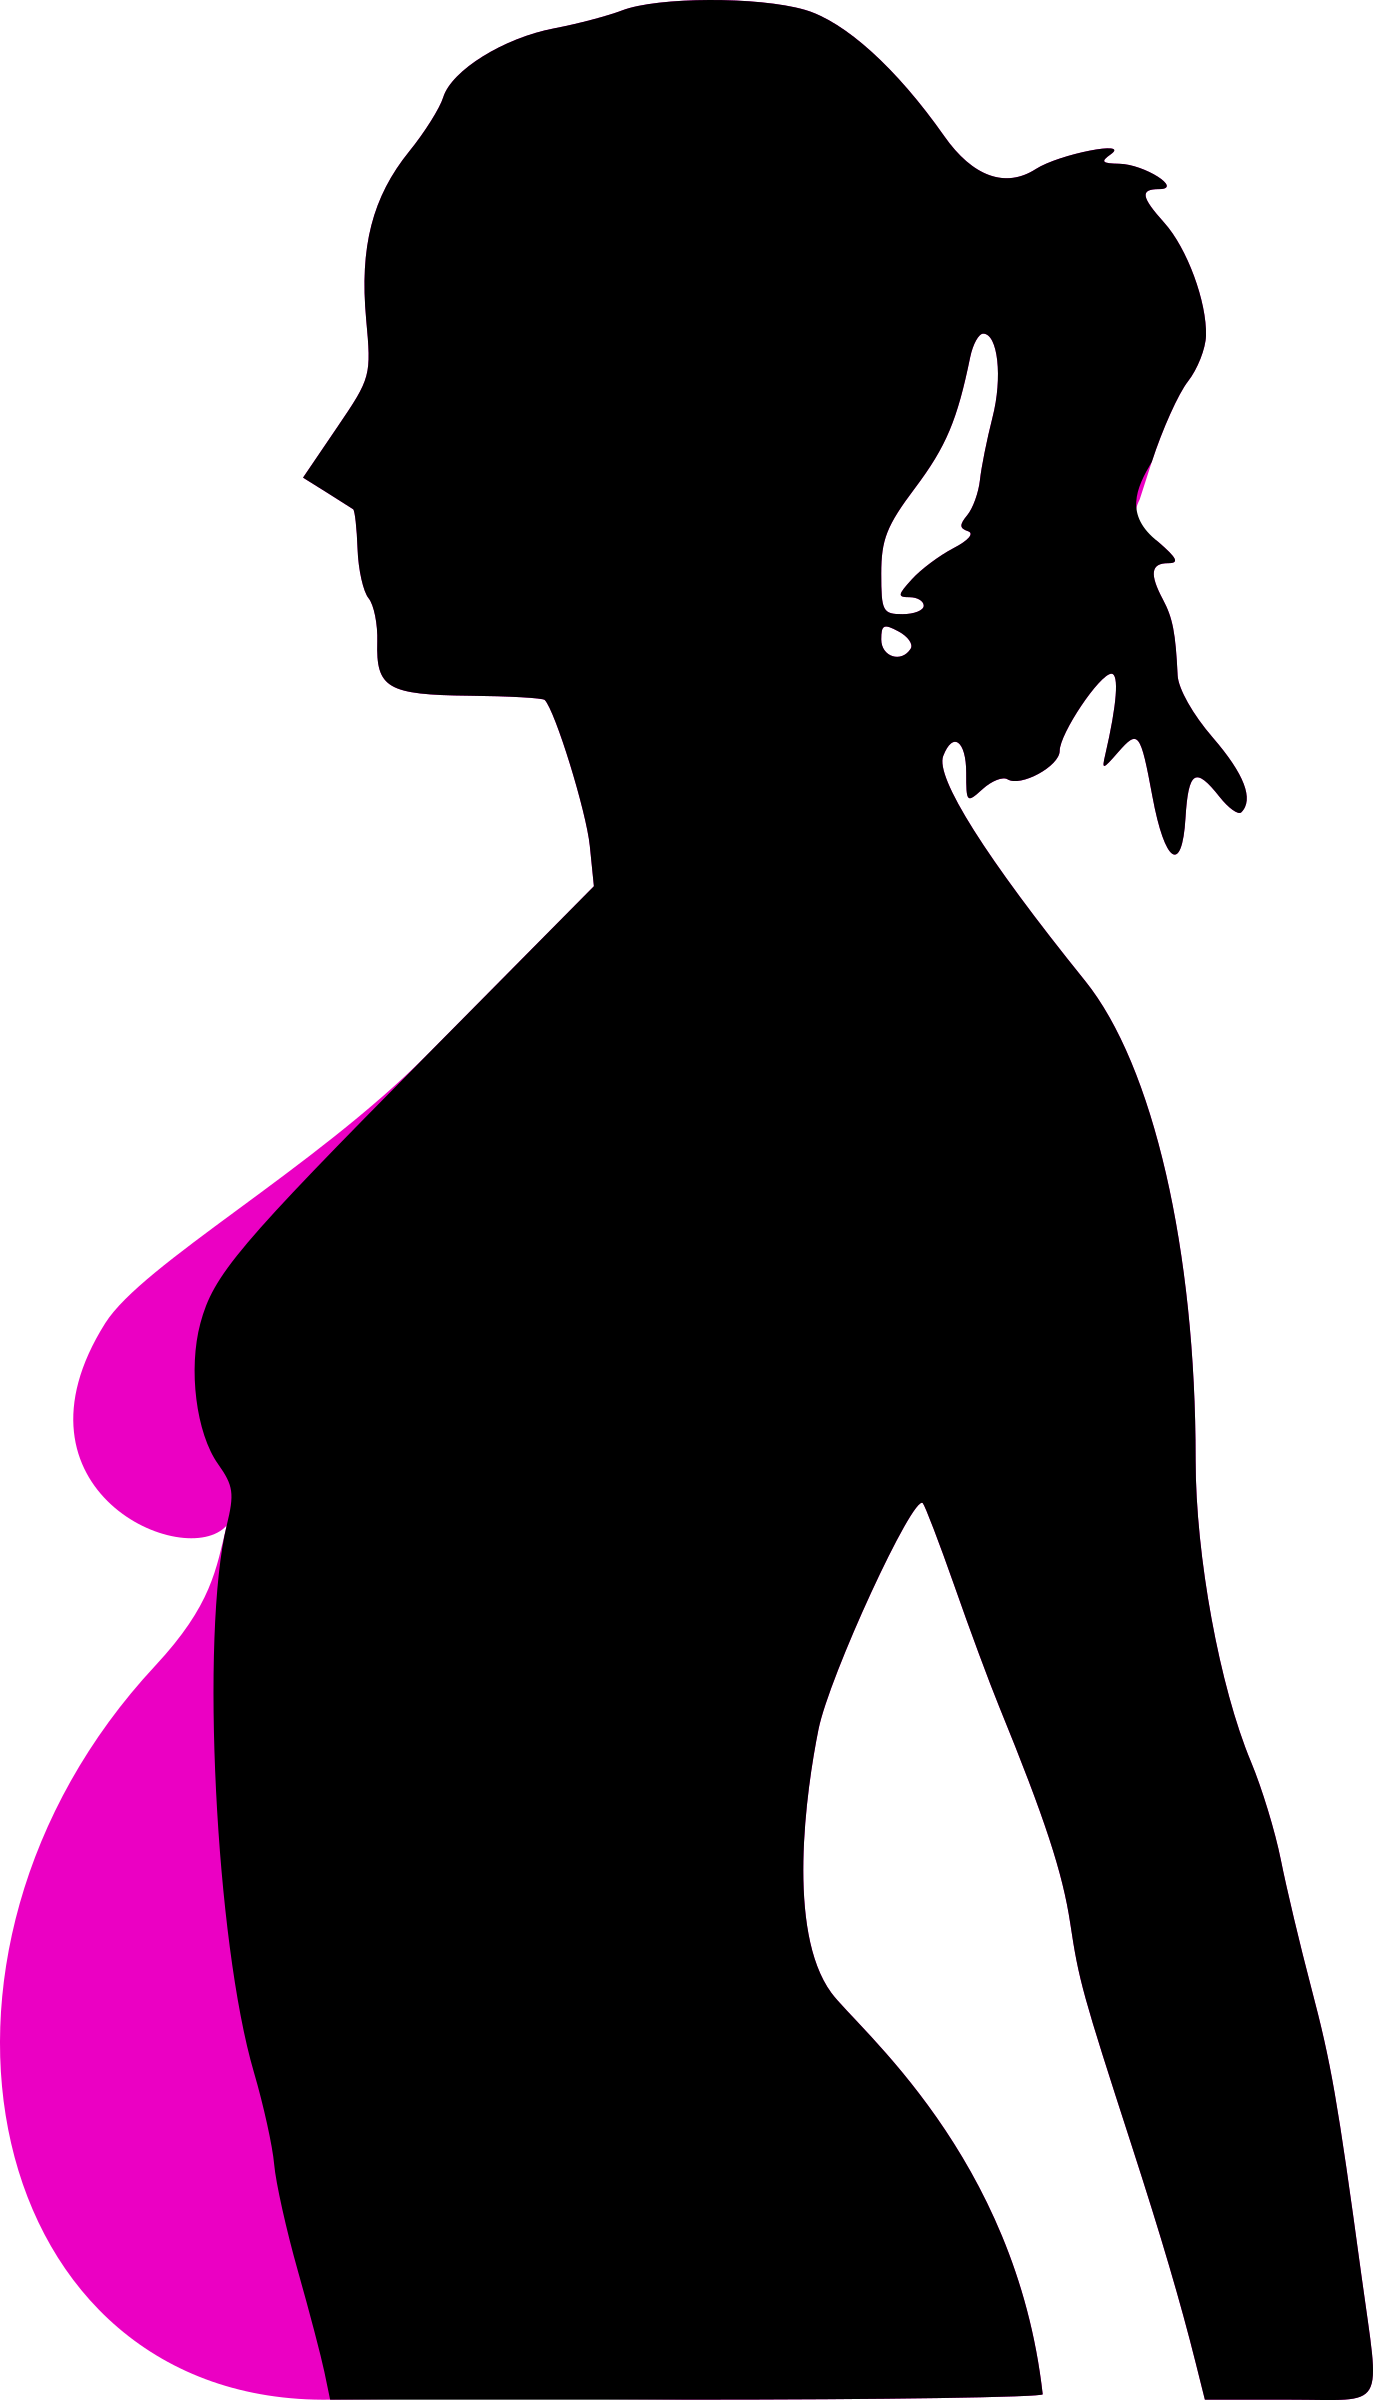 Pregnancy silhouet big image. Lady clipart pregnant